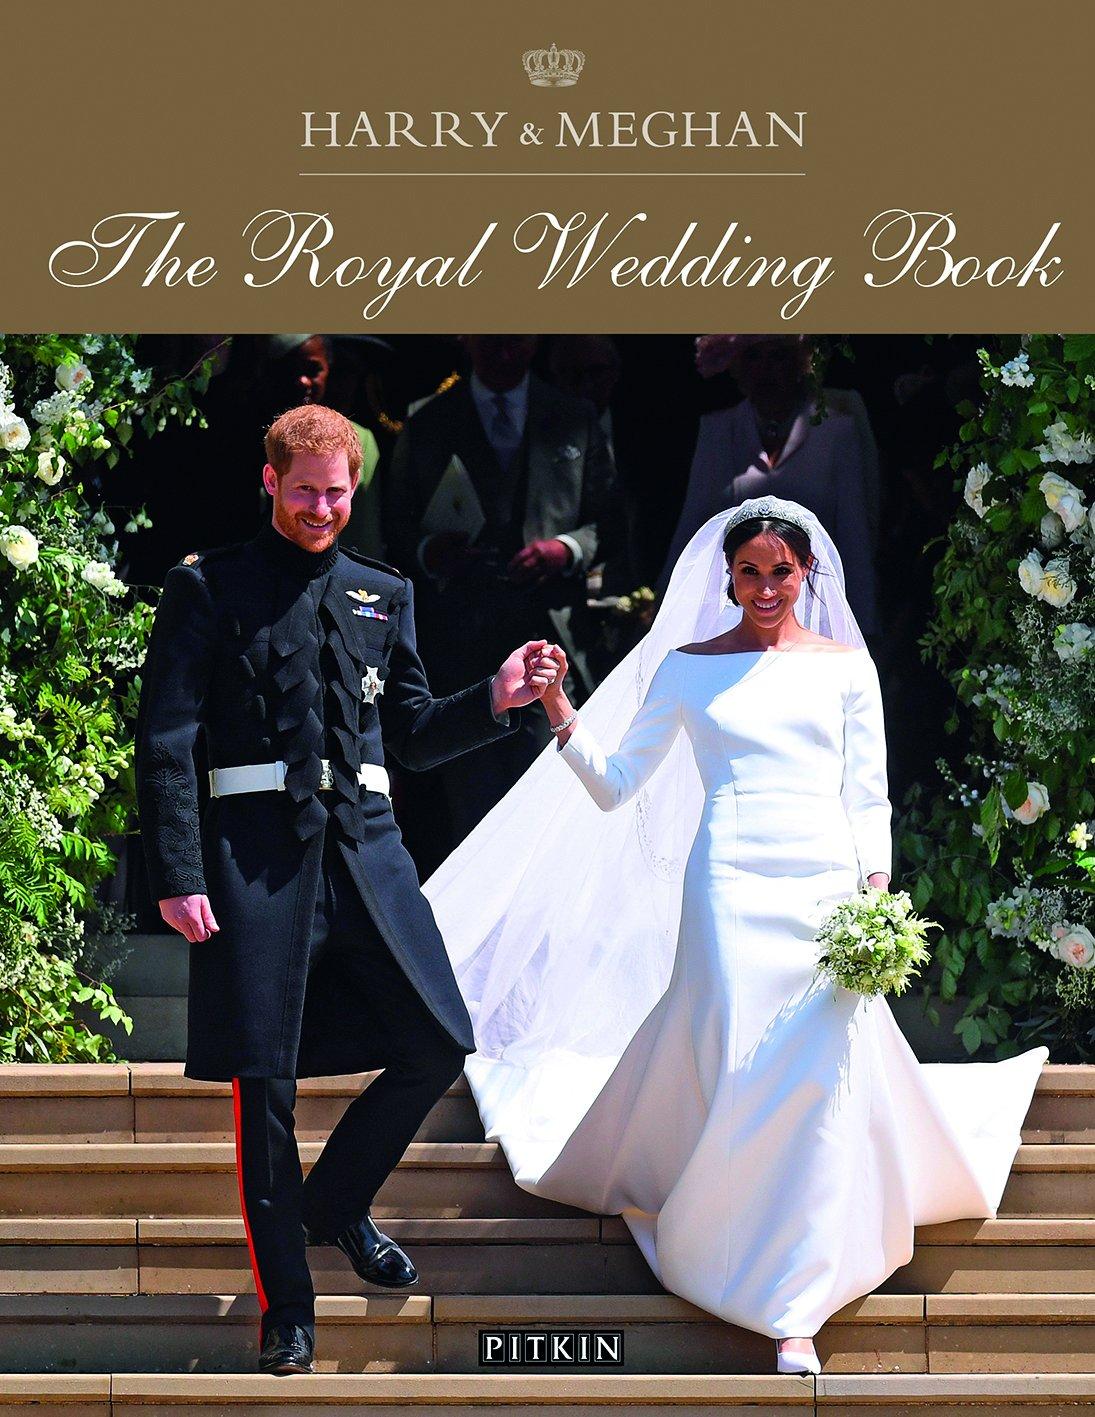 Harry & Meghan The Royal Wedding Book  Sadat, Halima Amazon.de ...